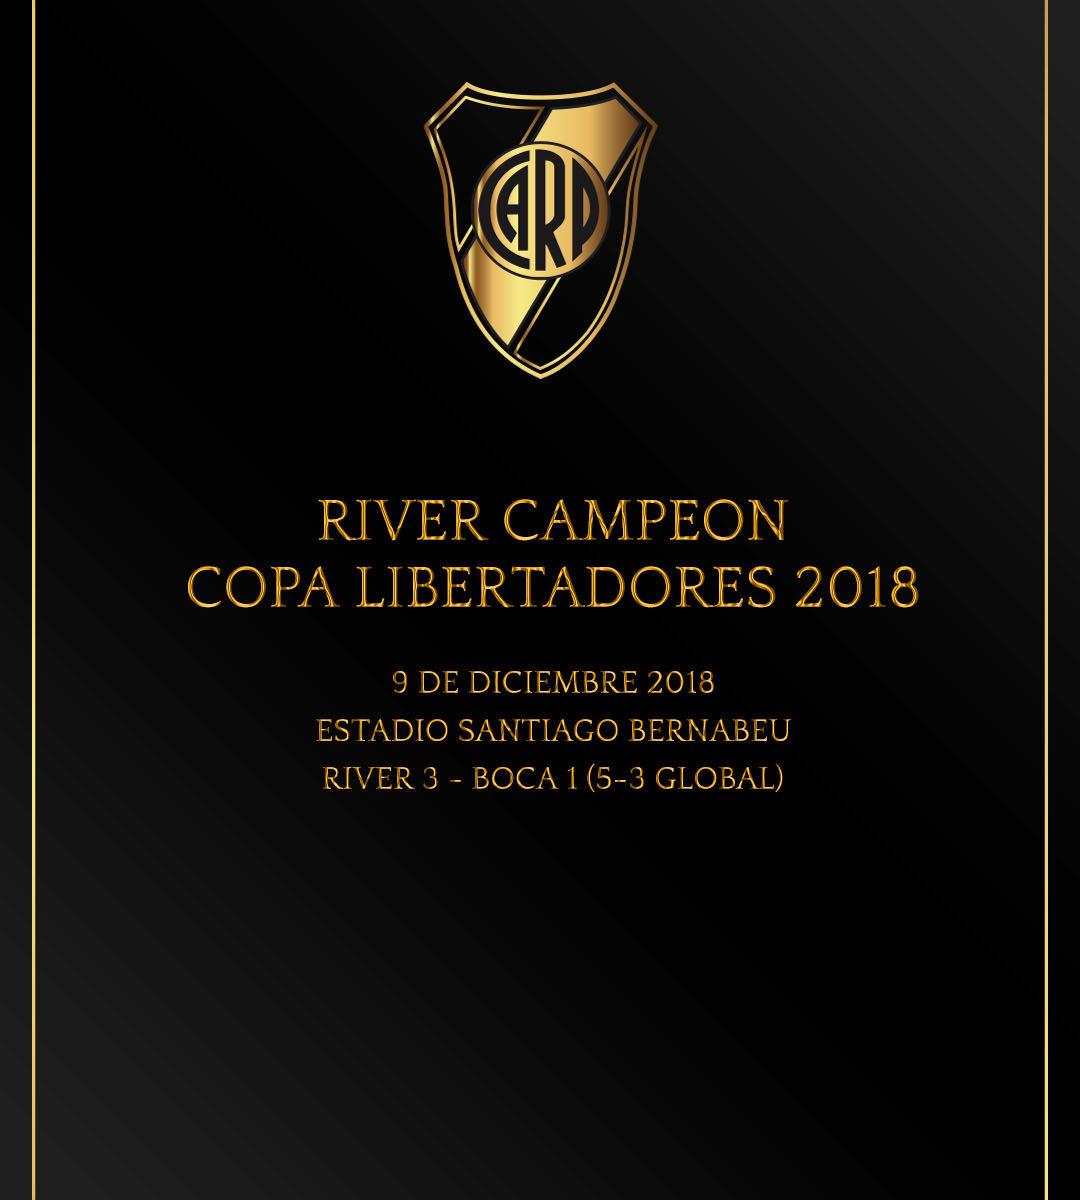 imagenes-de-river-plate-para-telefono-celular-fondos-de-pantalla-wallpaper-de-river-campeon copa libertadores de america 2018